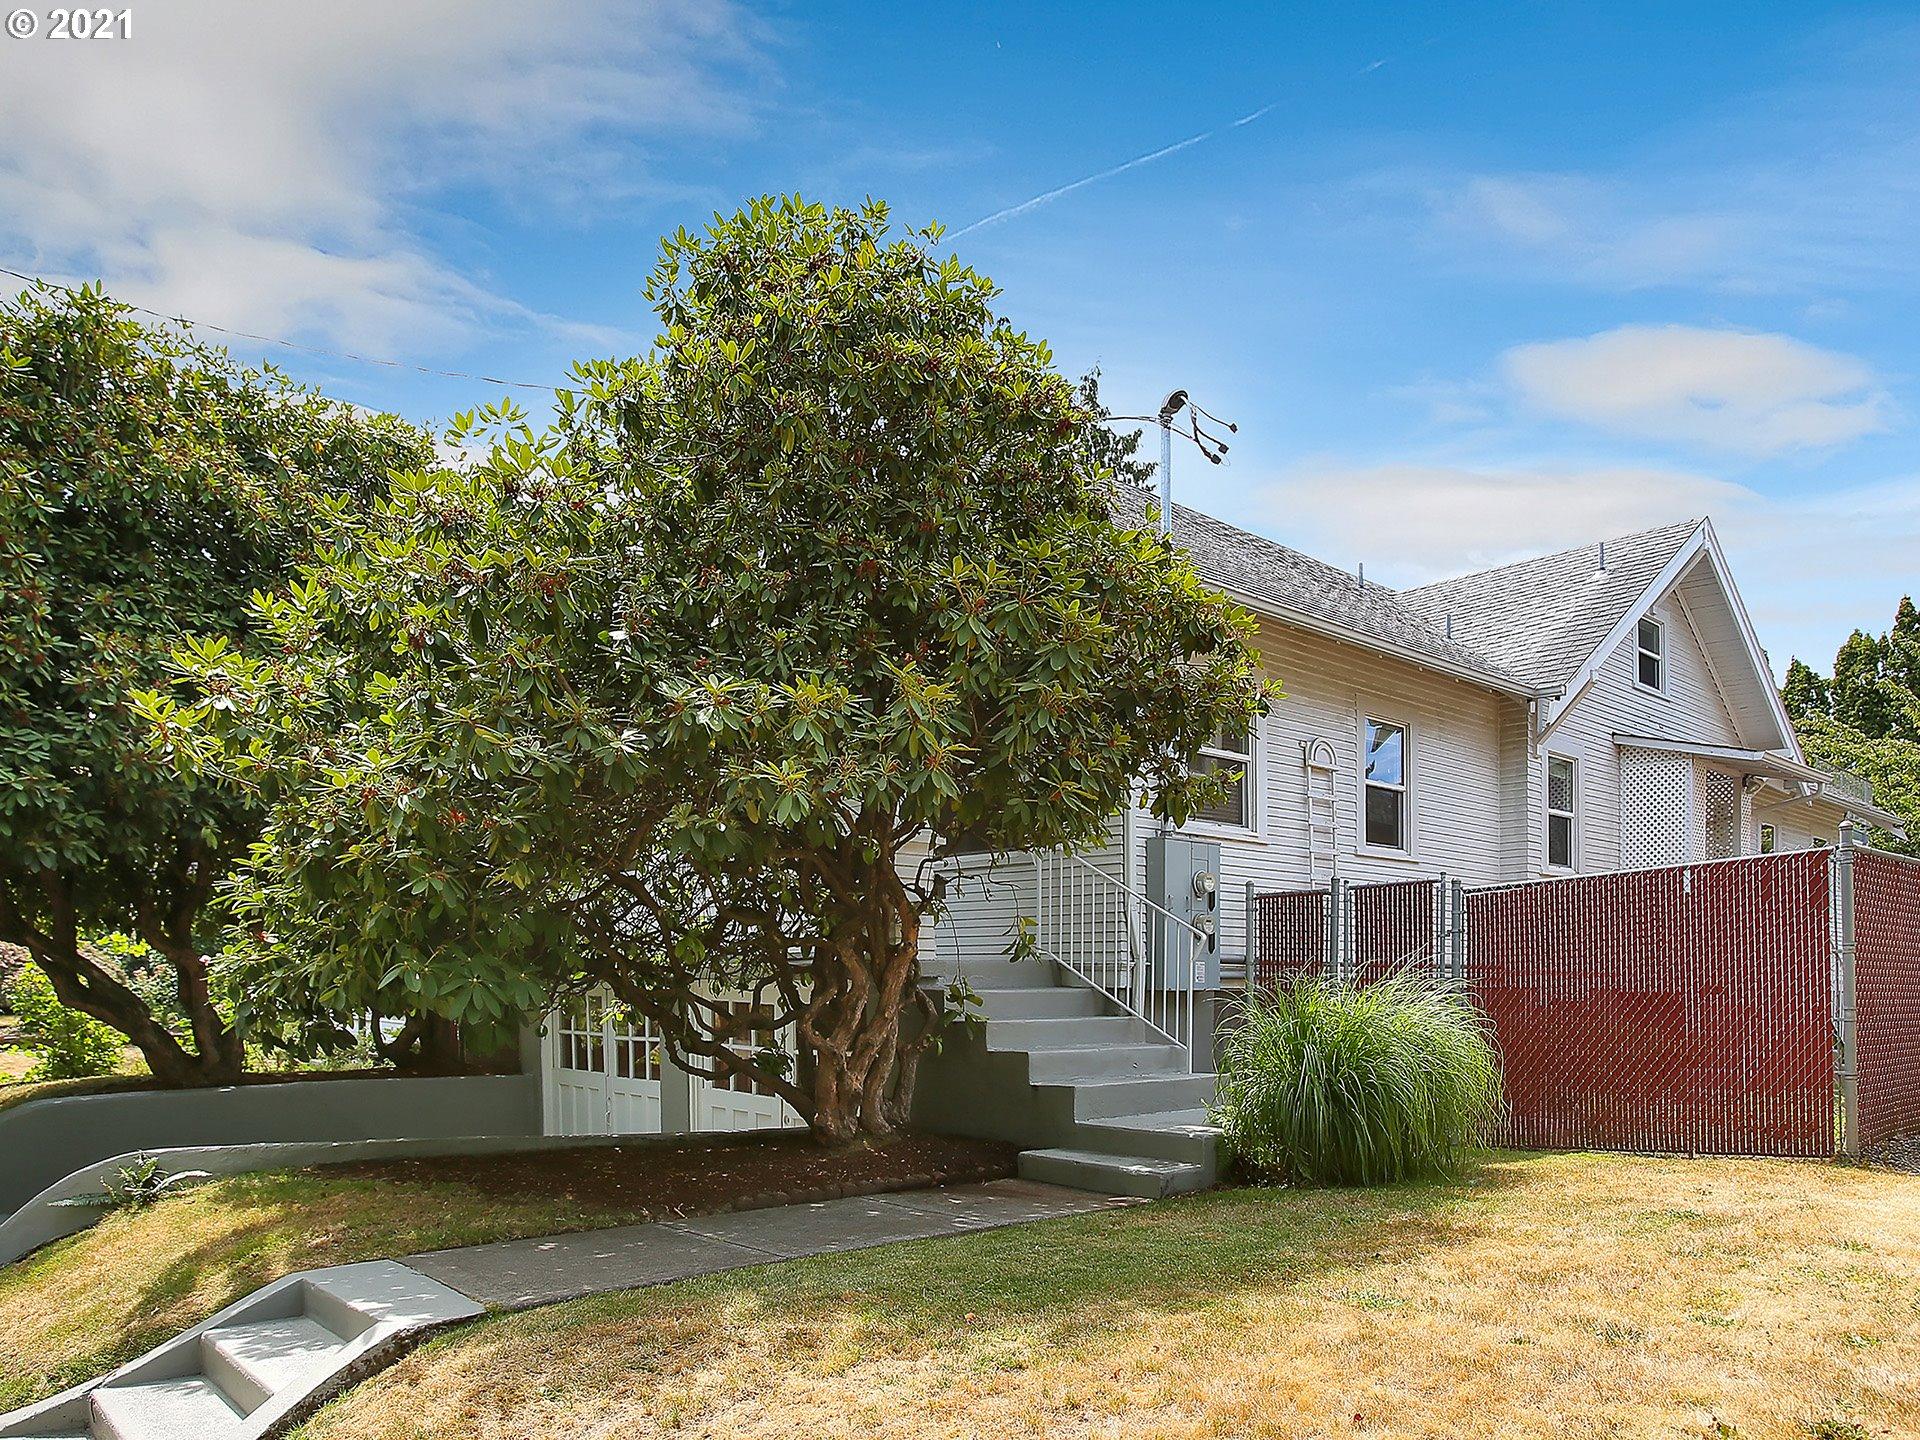 3823 N OVERLOOK BLVD, Portland OR 97227